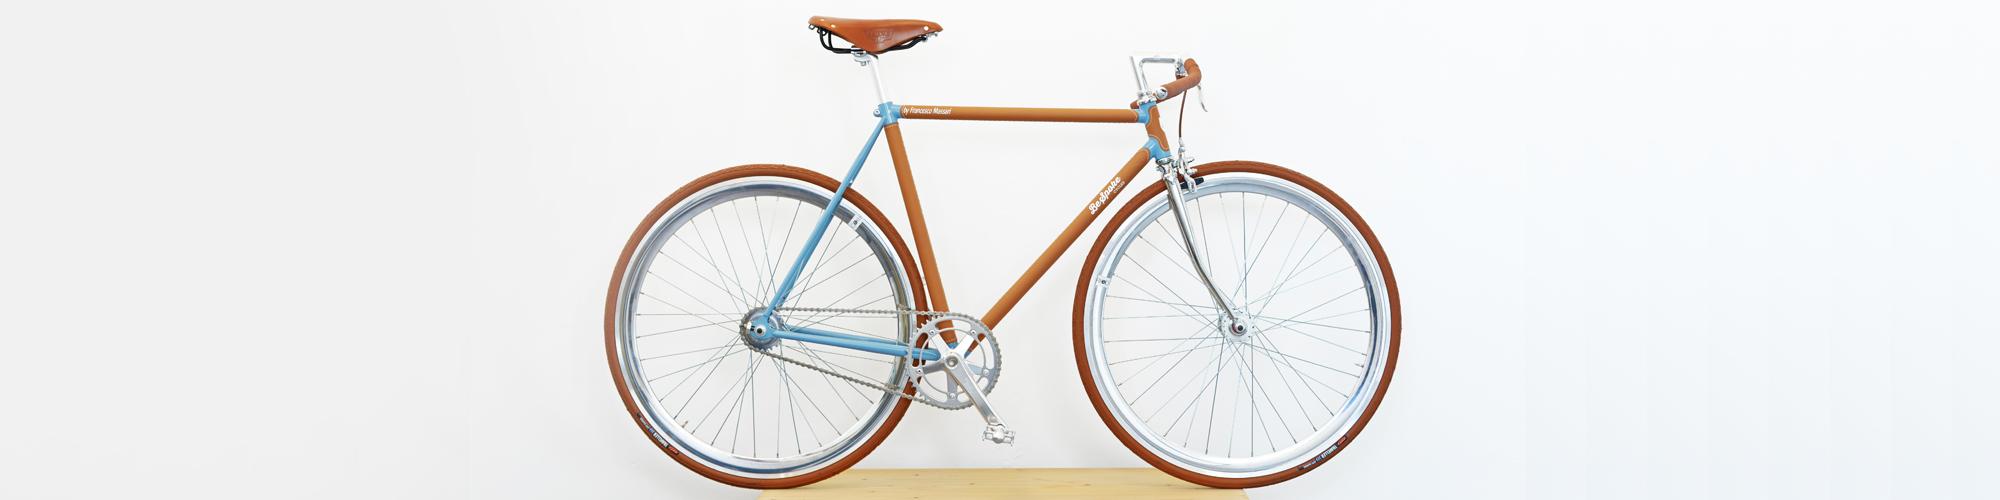 Bespoke-bike1